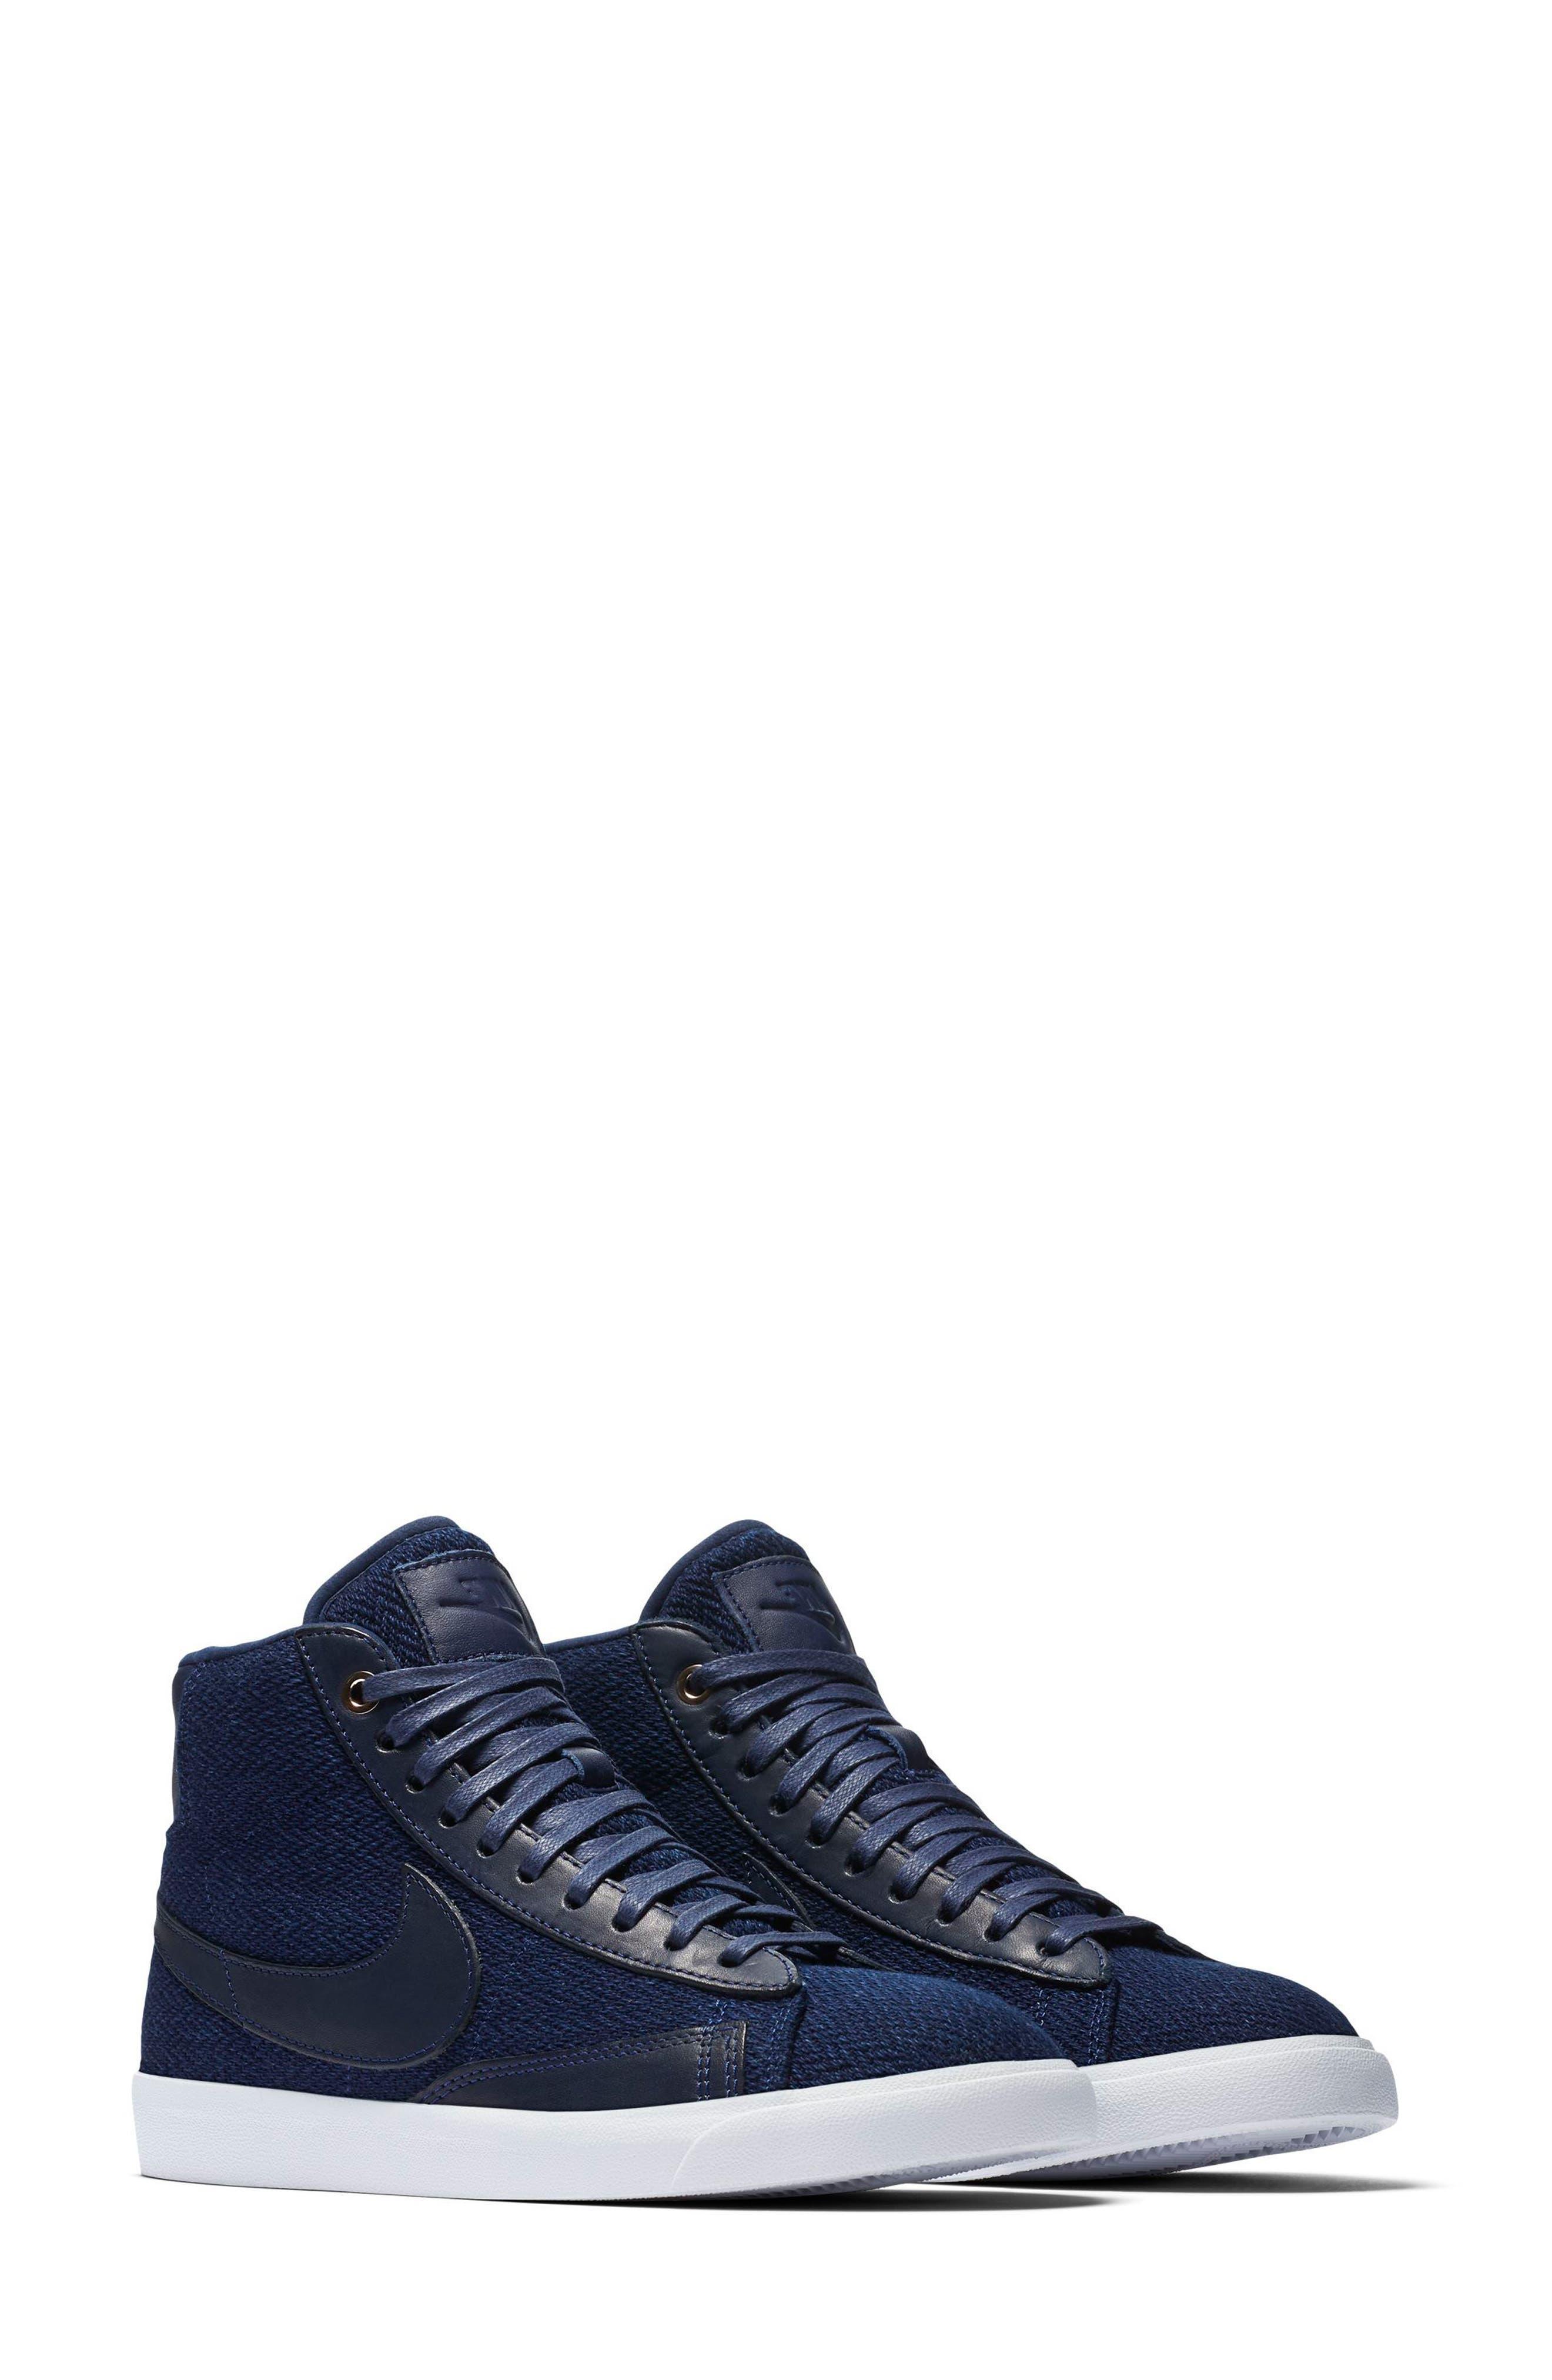 Blazer Mid Premium LX Sneaker,                         Main,                         color, 400